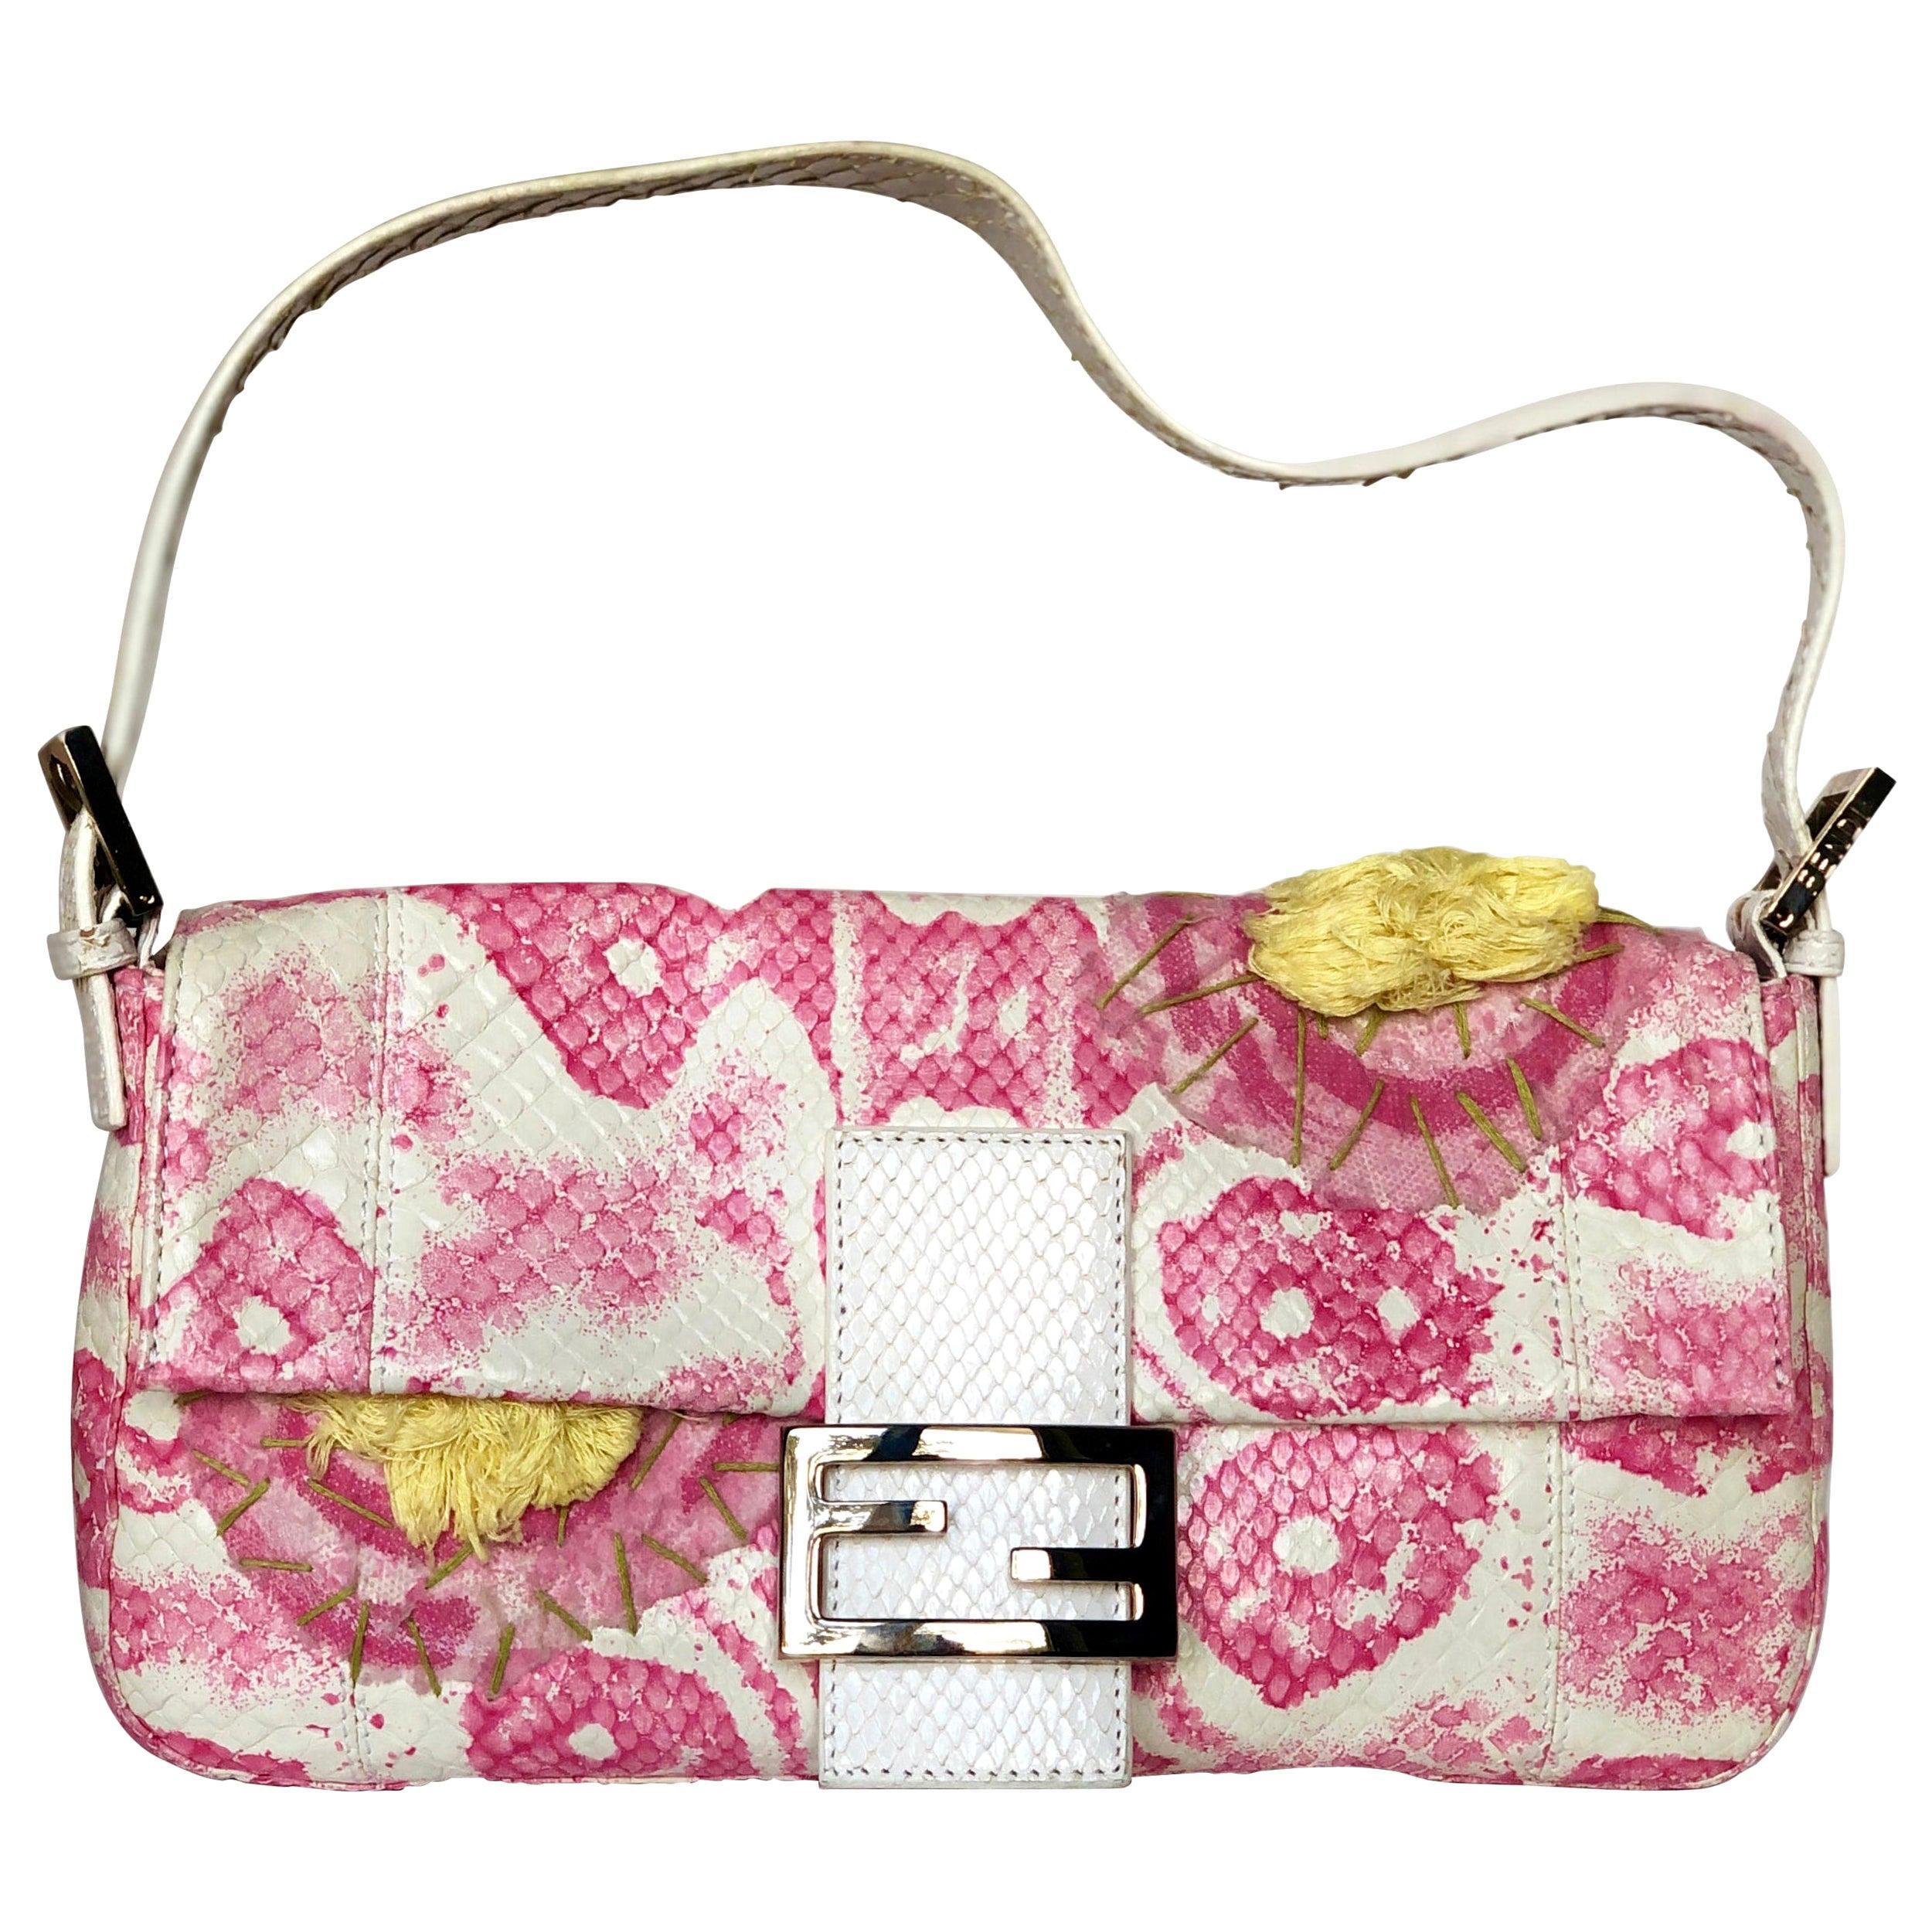 Fendi White Snake Skin w/ Pink & Yellow Accents Baguette Handbag